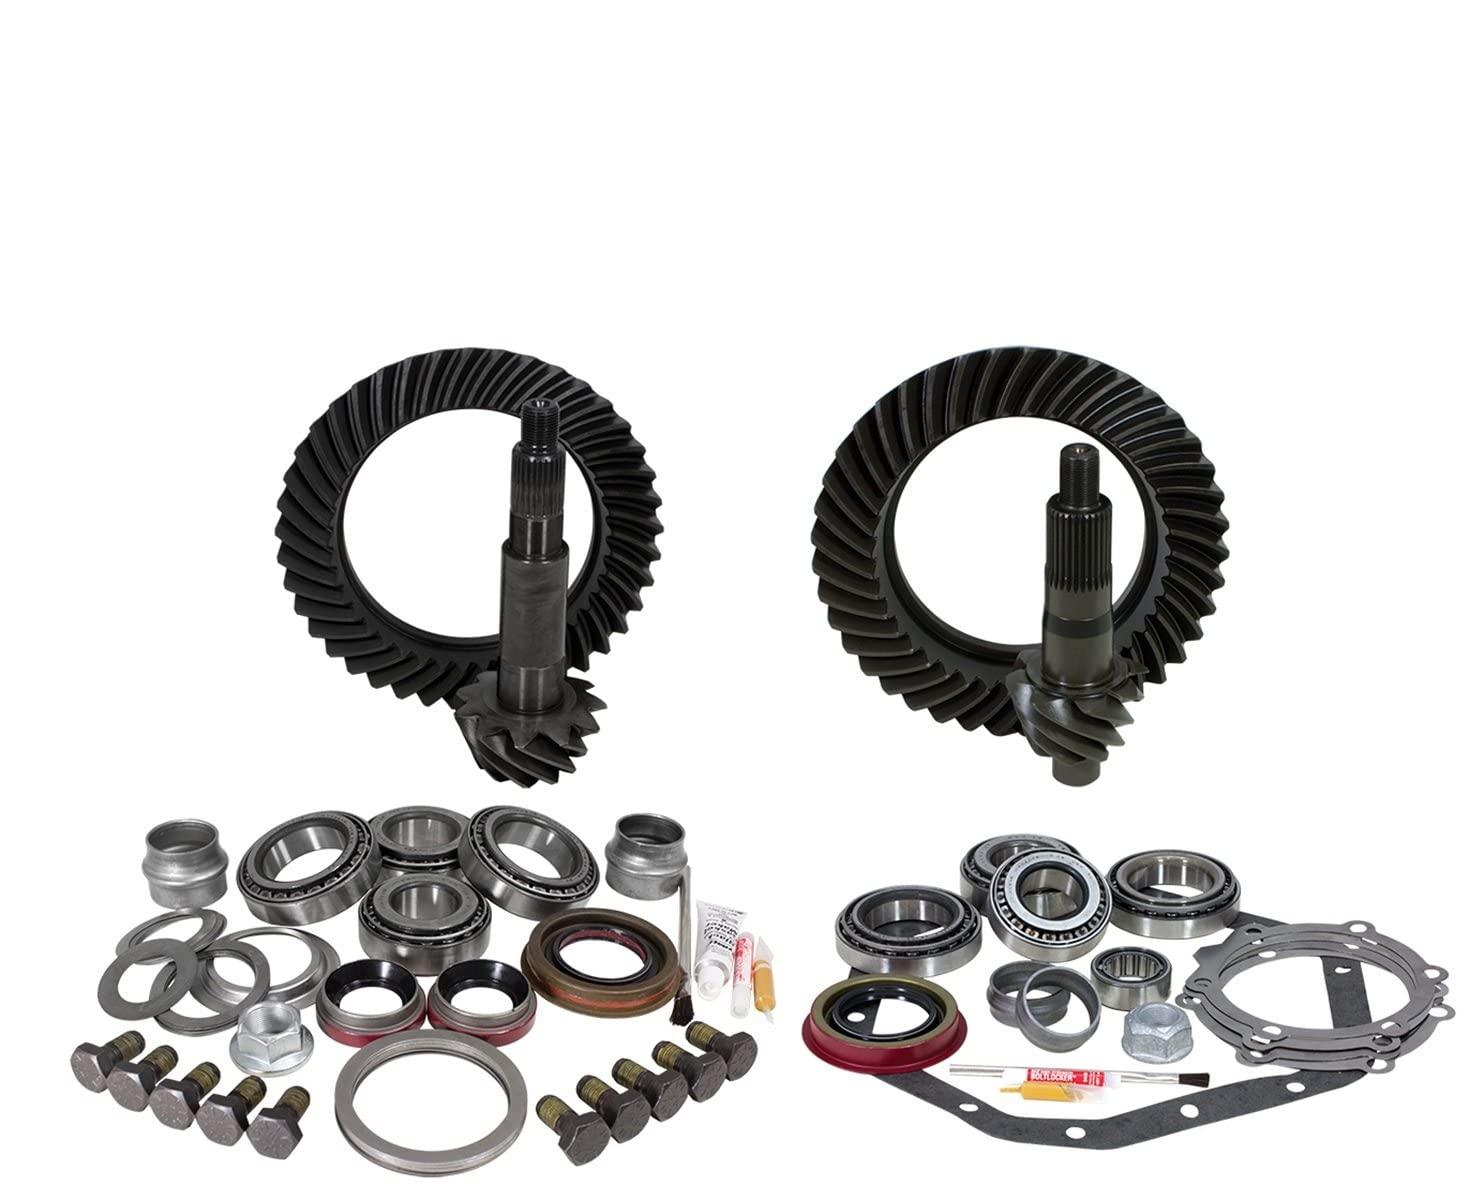 Yukon Gear & Axle (YGK022) Gear & Install Kit for GM 14T Dana 60 5.13 Ratio Standard Rotation